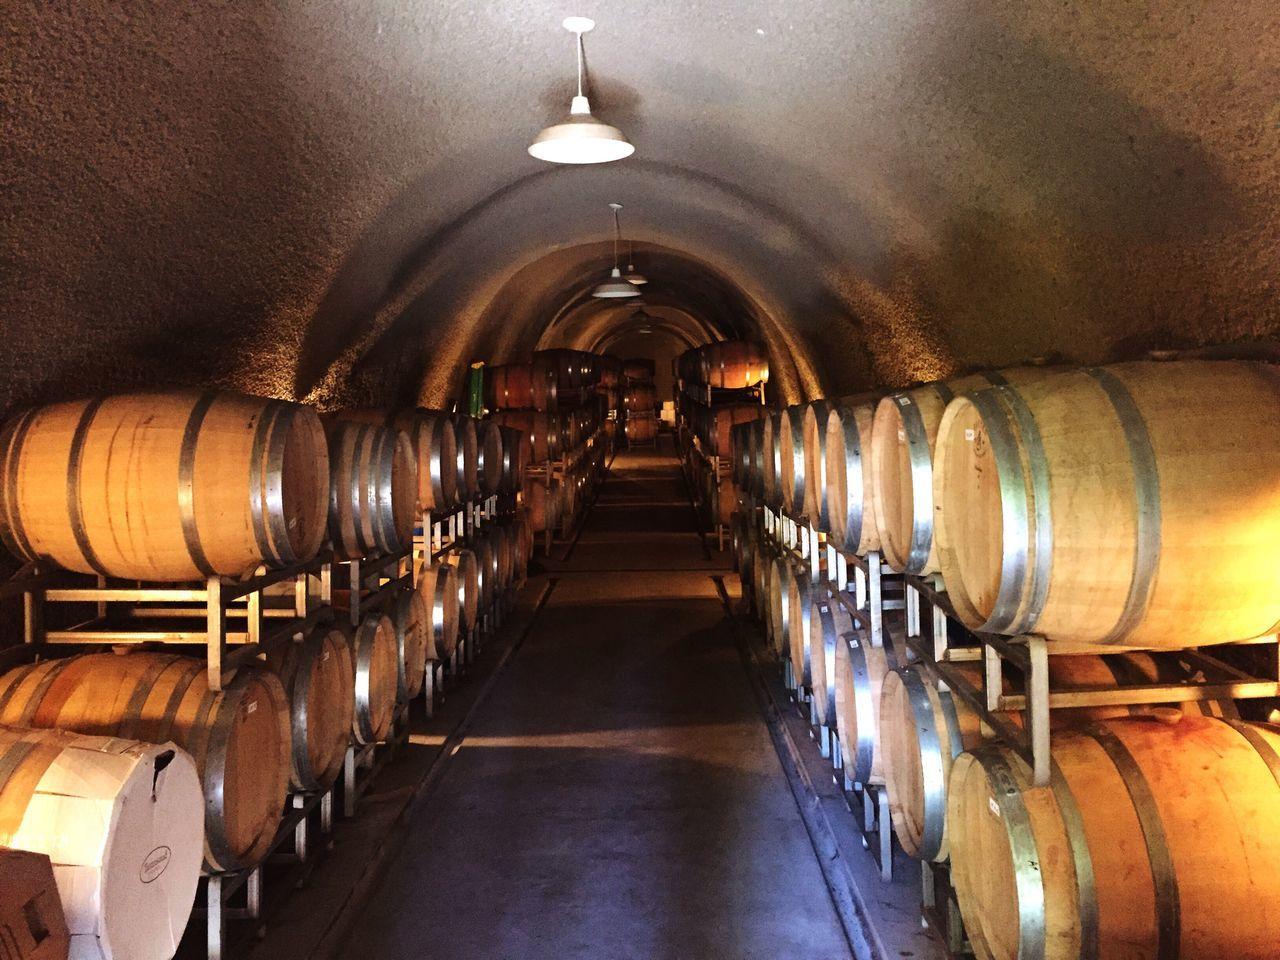 Ñapa Wine Wine Cellar Wine Barrels Cellar